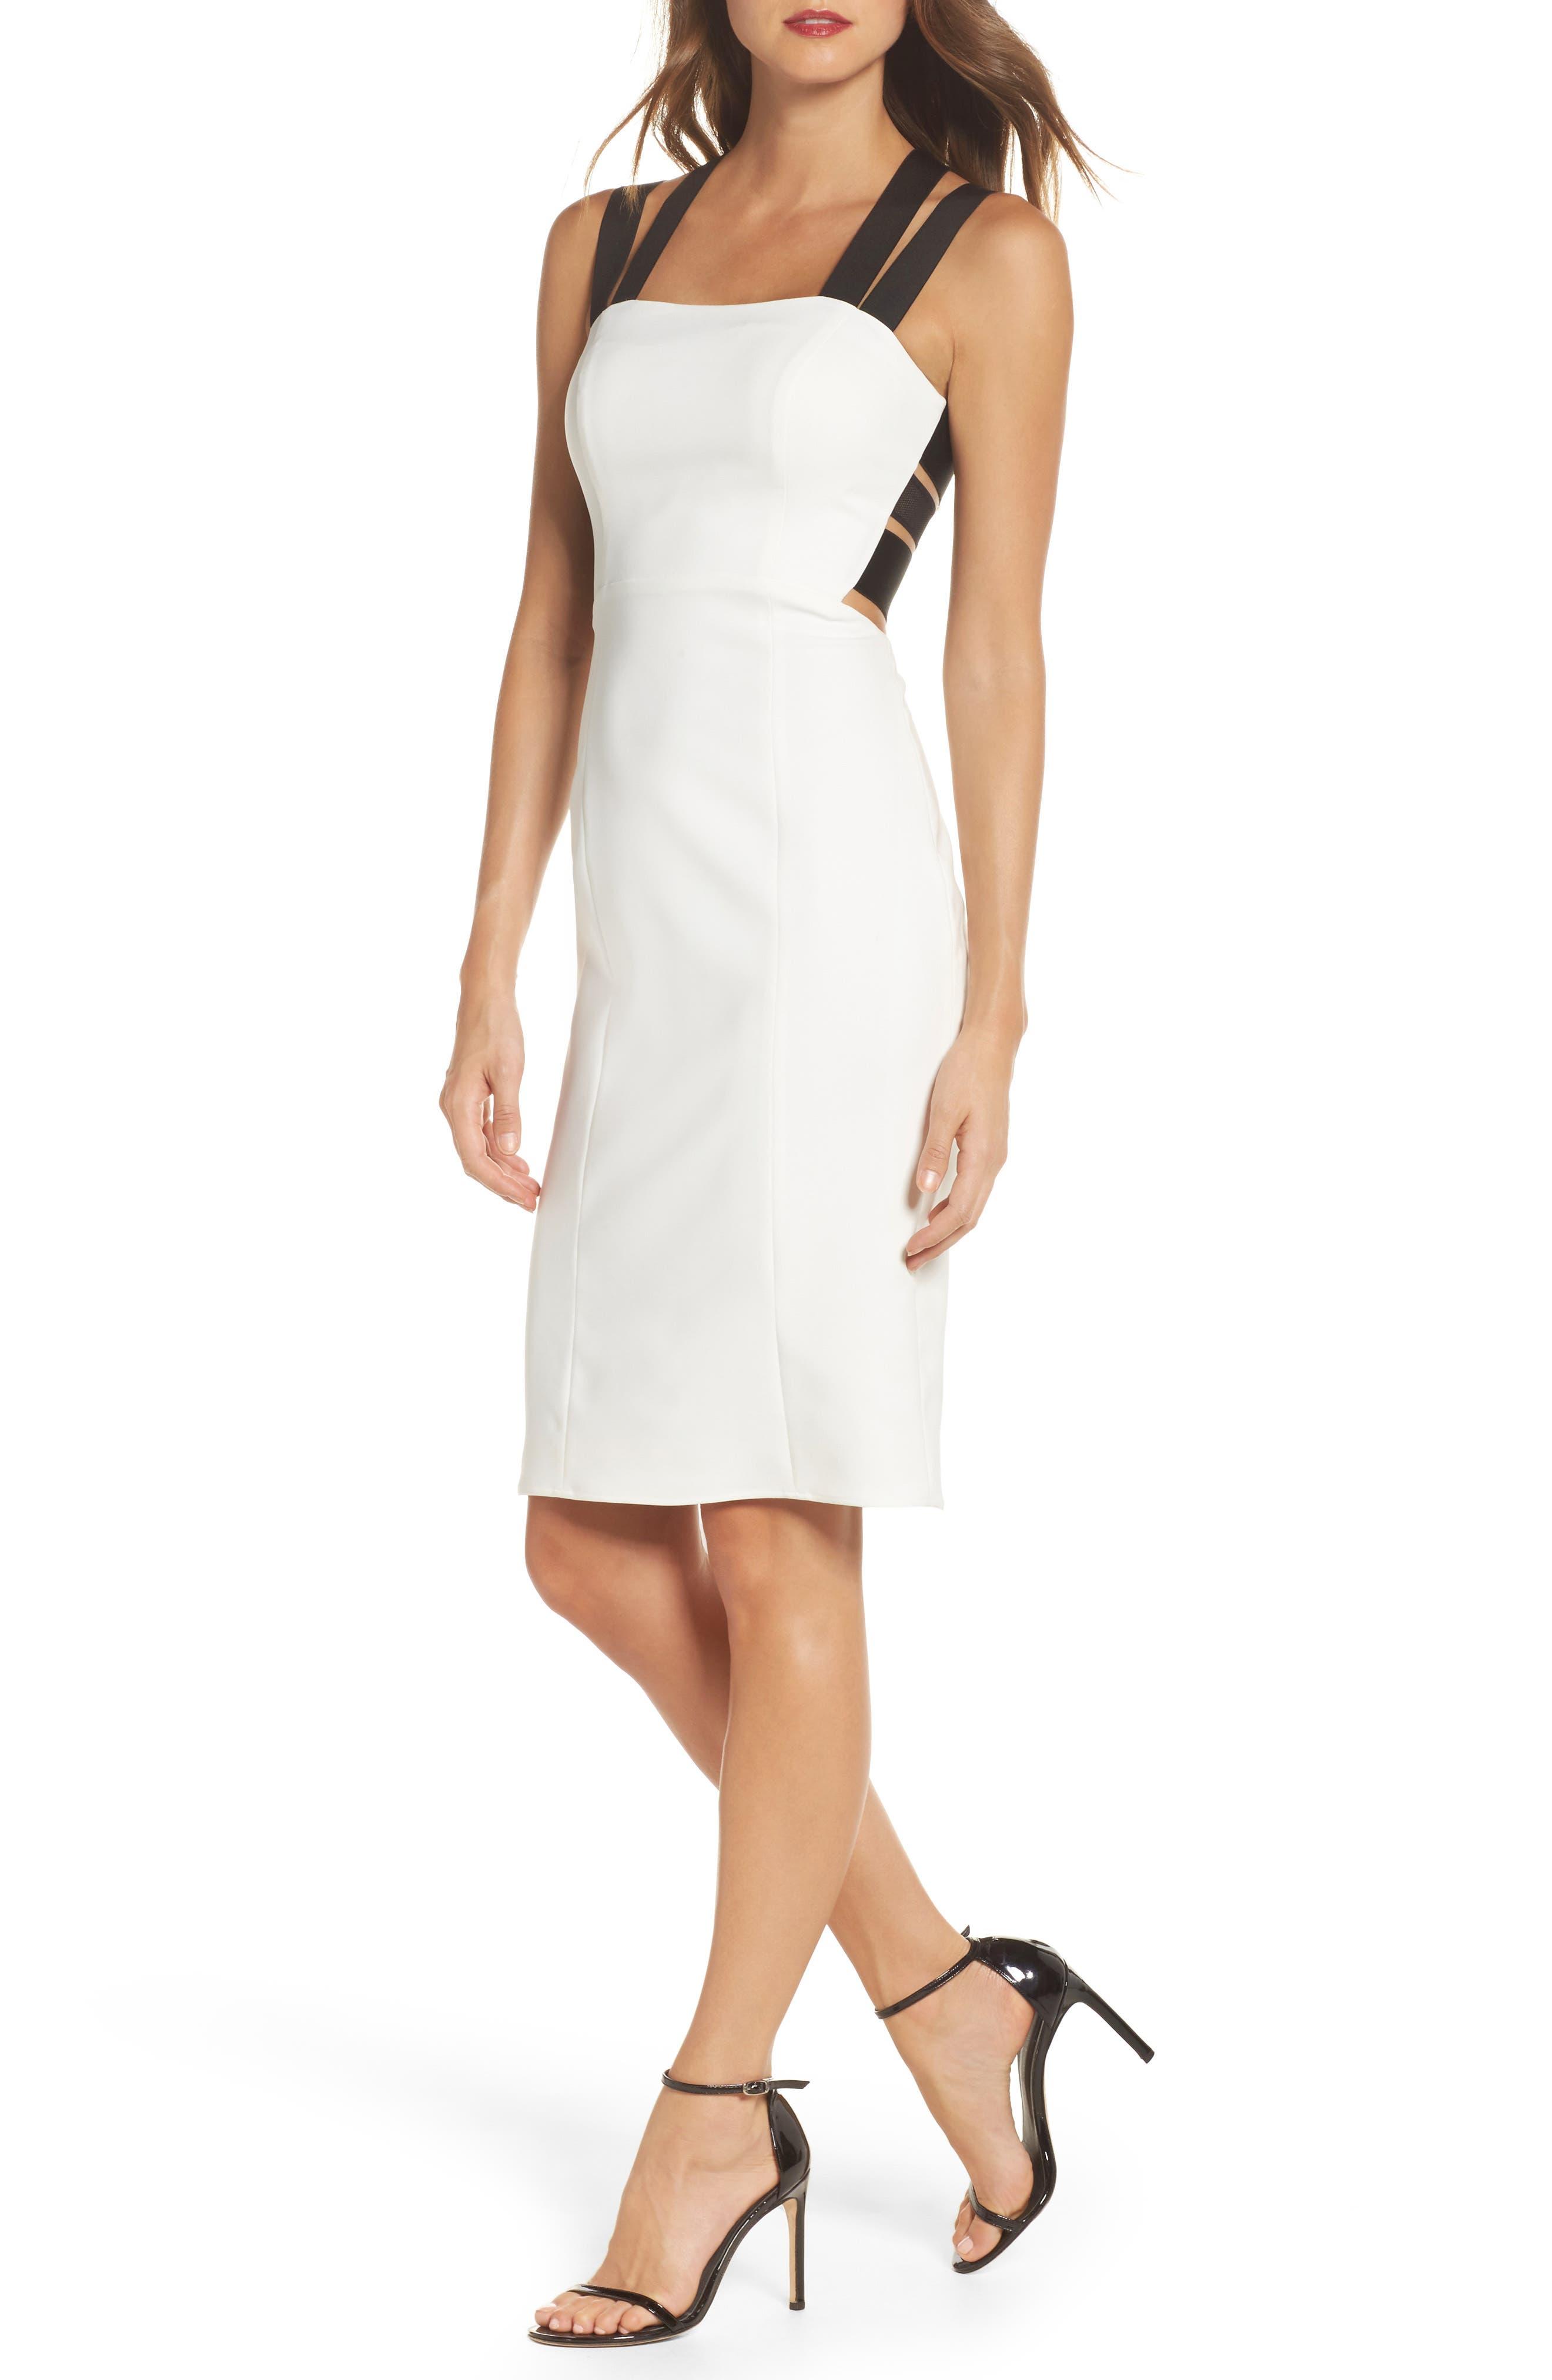 Kate Elastic Strap Cutout Sheath Dress,                             Main thumbnail 1, color,                             902